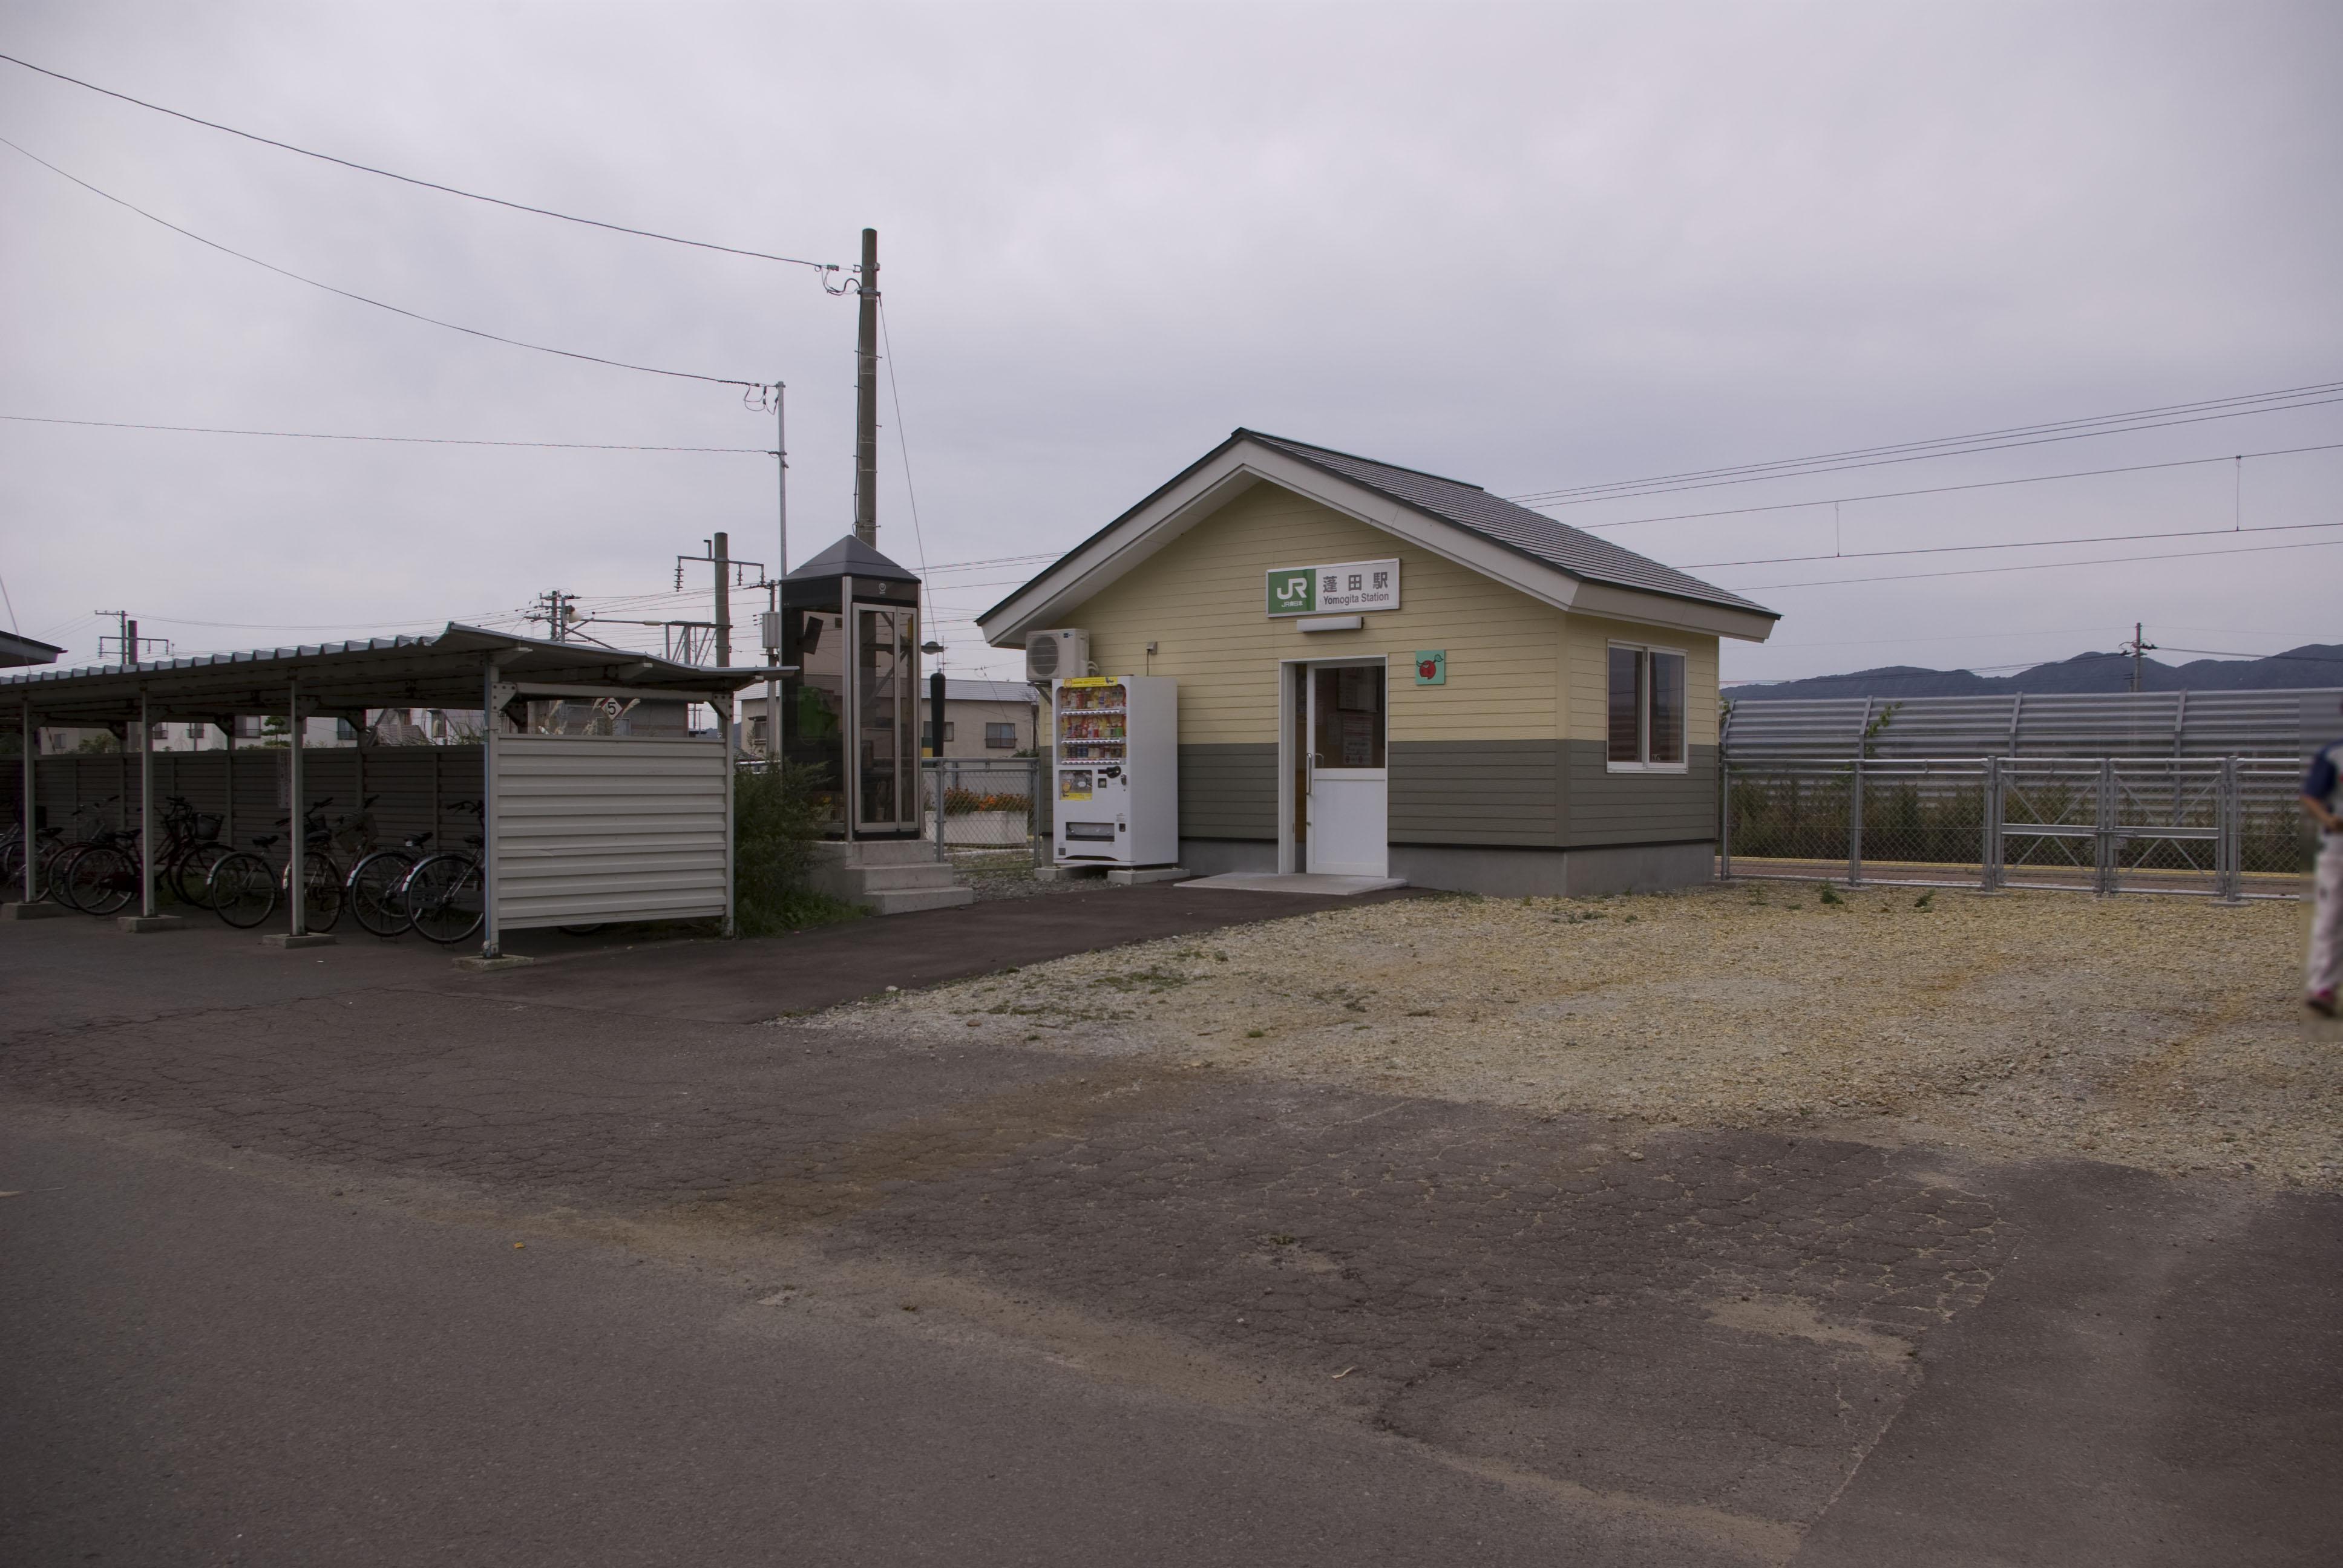 https://upload.wikimedia.org/wikipedia/commons/9/99/JR_Yomogita_sta_001.jpg